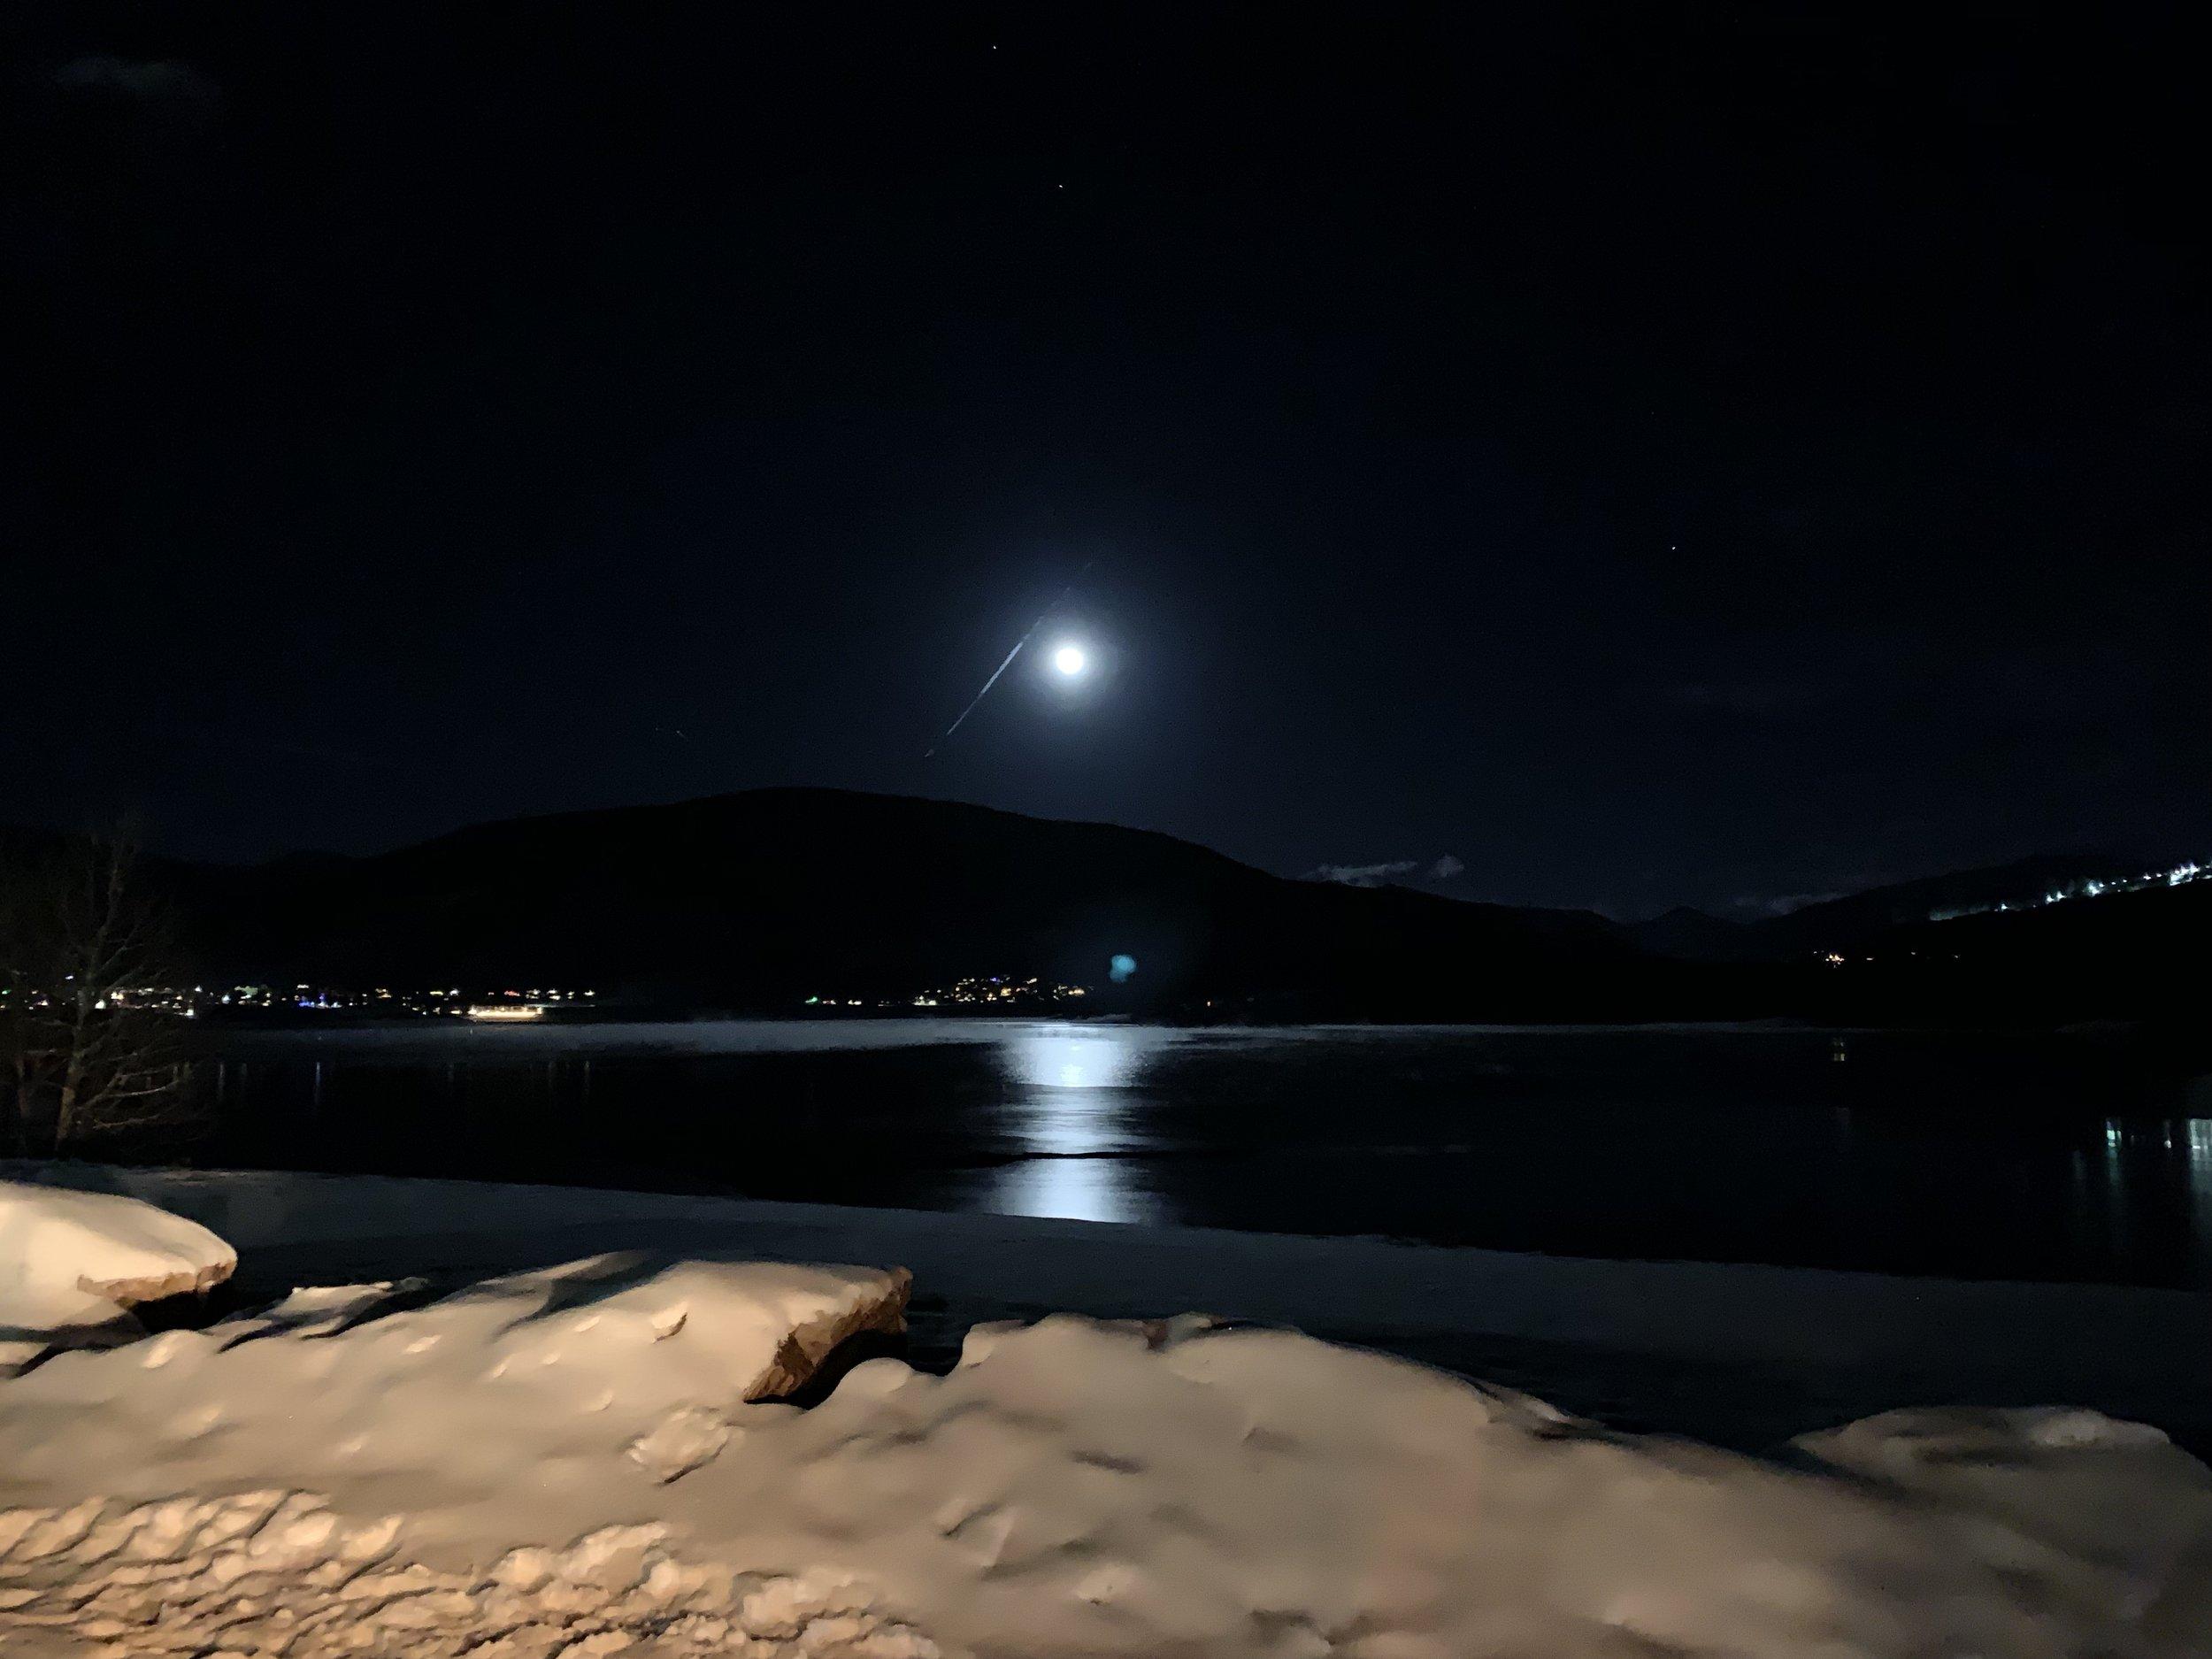 The Christmas Eve moon was amazing!